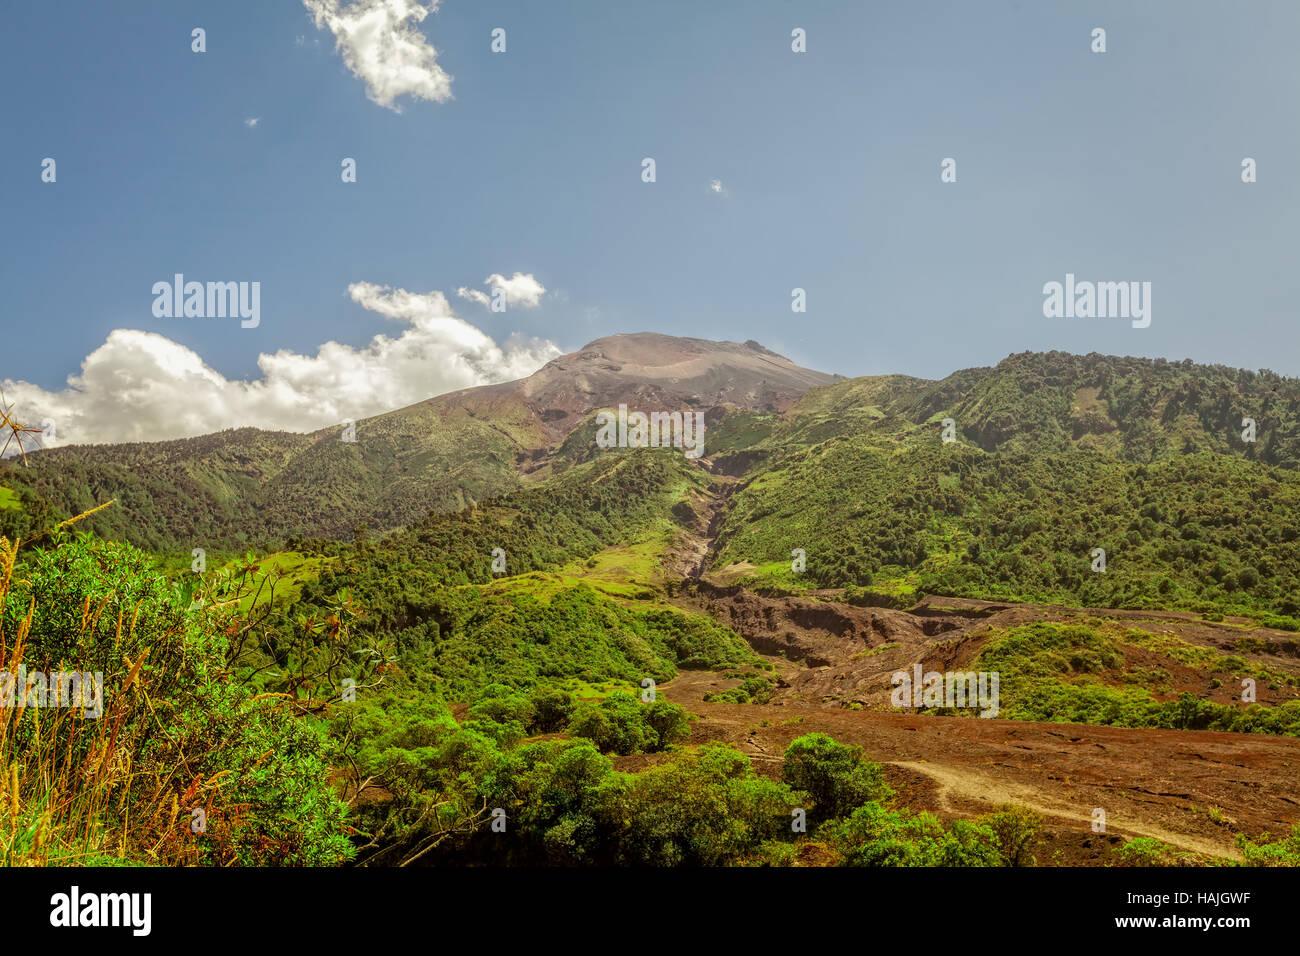 Panoramic View Of Dormant Tungurahua Volcano Mountain Volcano On A Sunny Day, Ecuador, South America Stock Photo